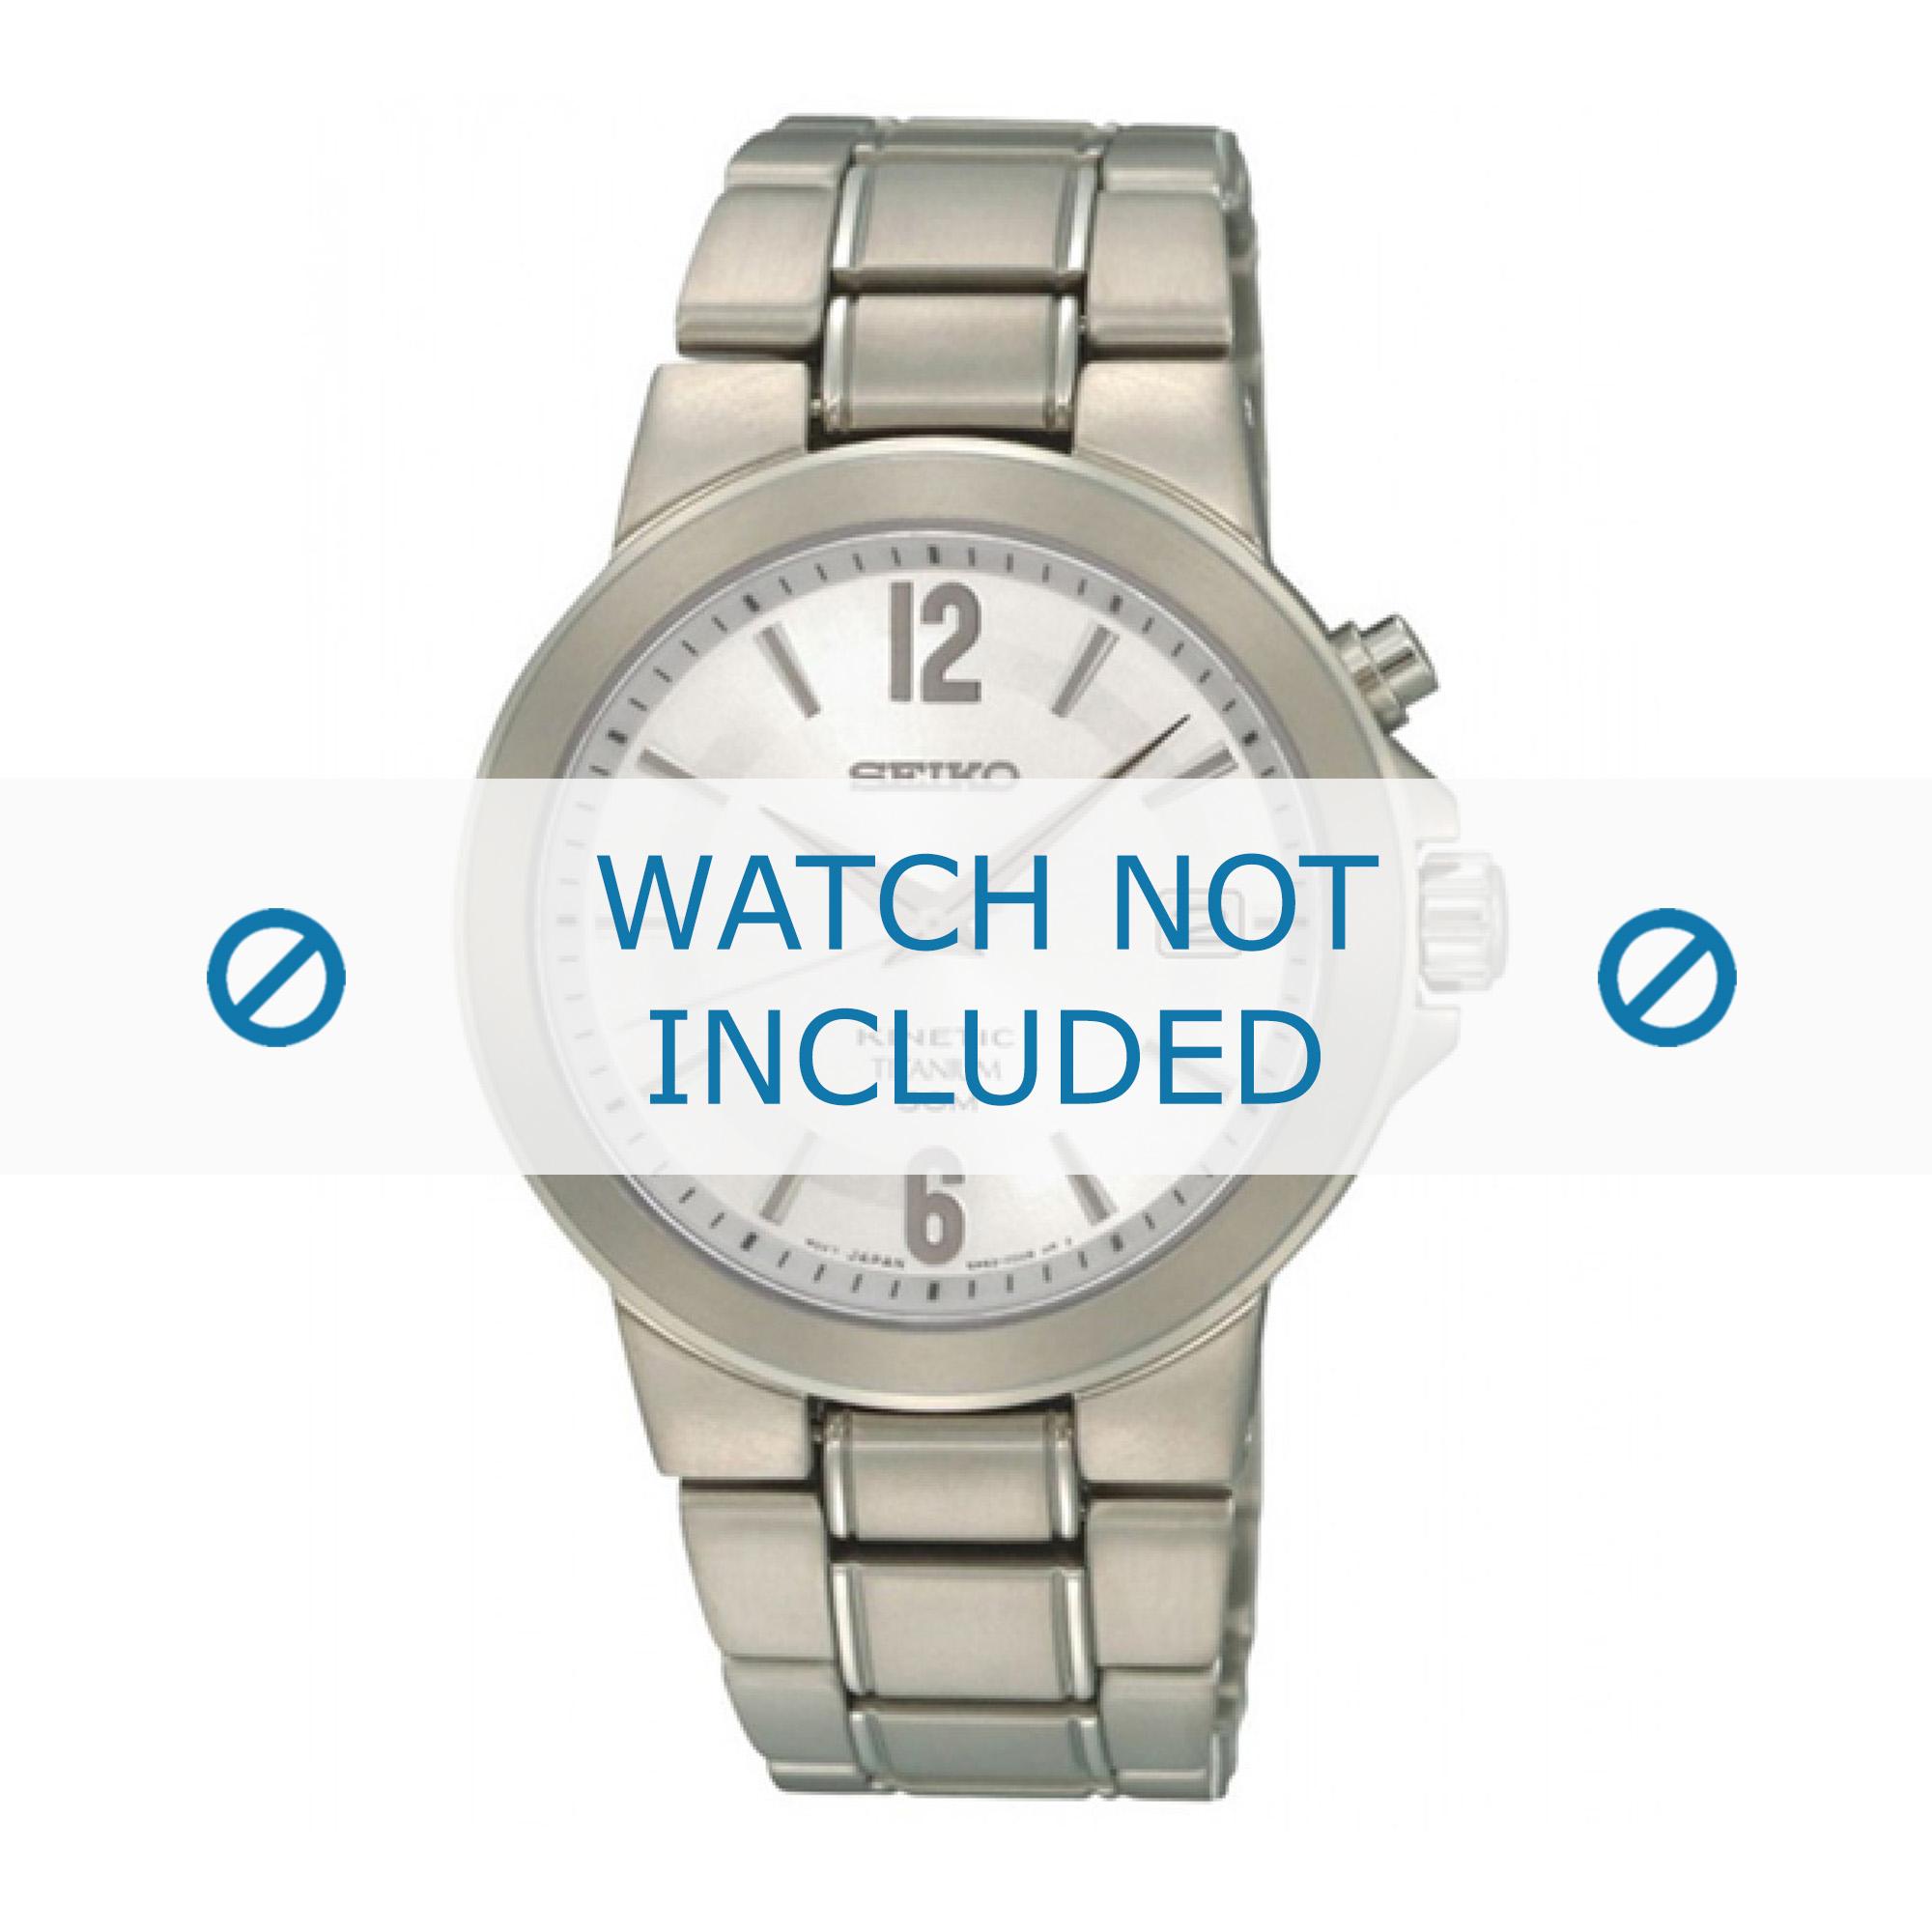 Seiko horlogeband SKA479P1 / 5M62 0BE0 Titanium Zilver